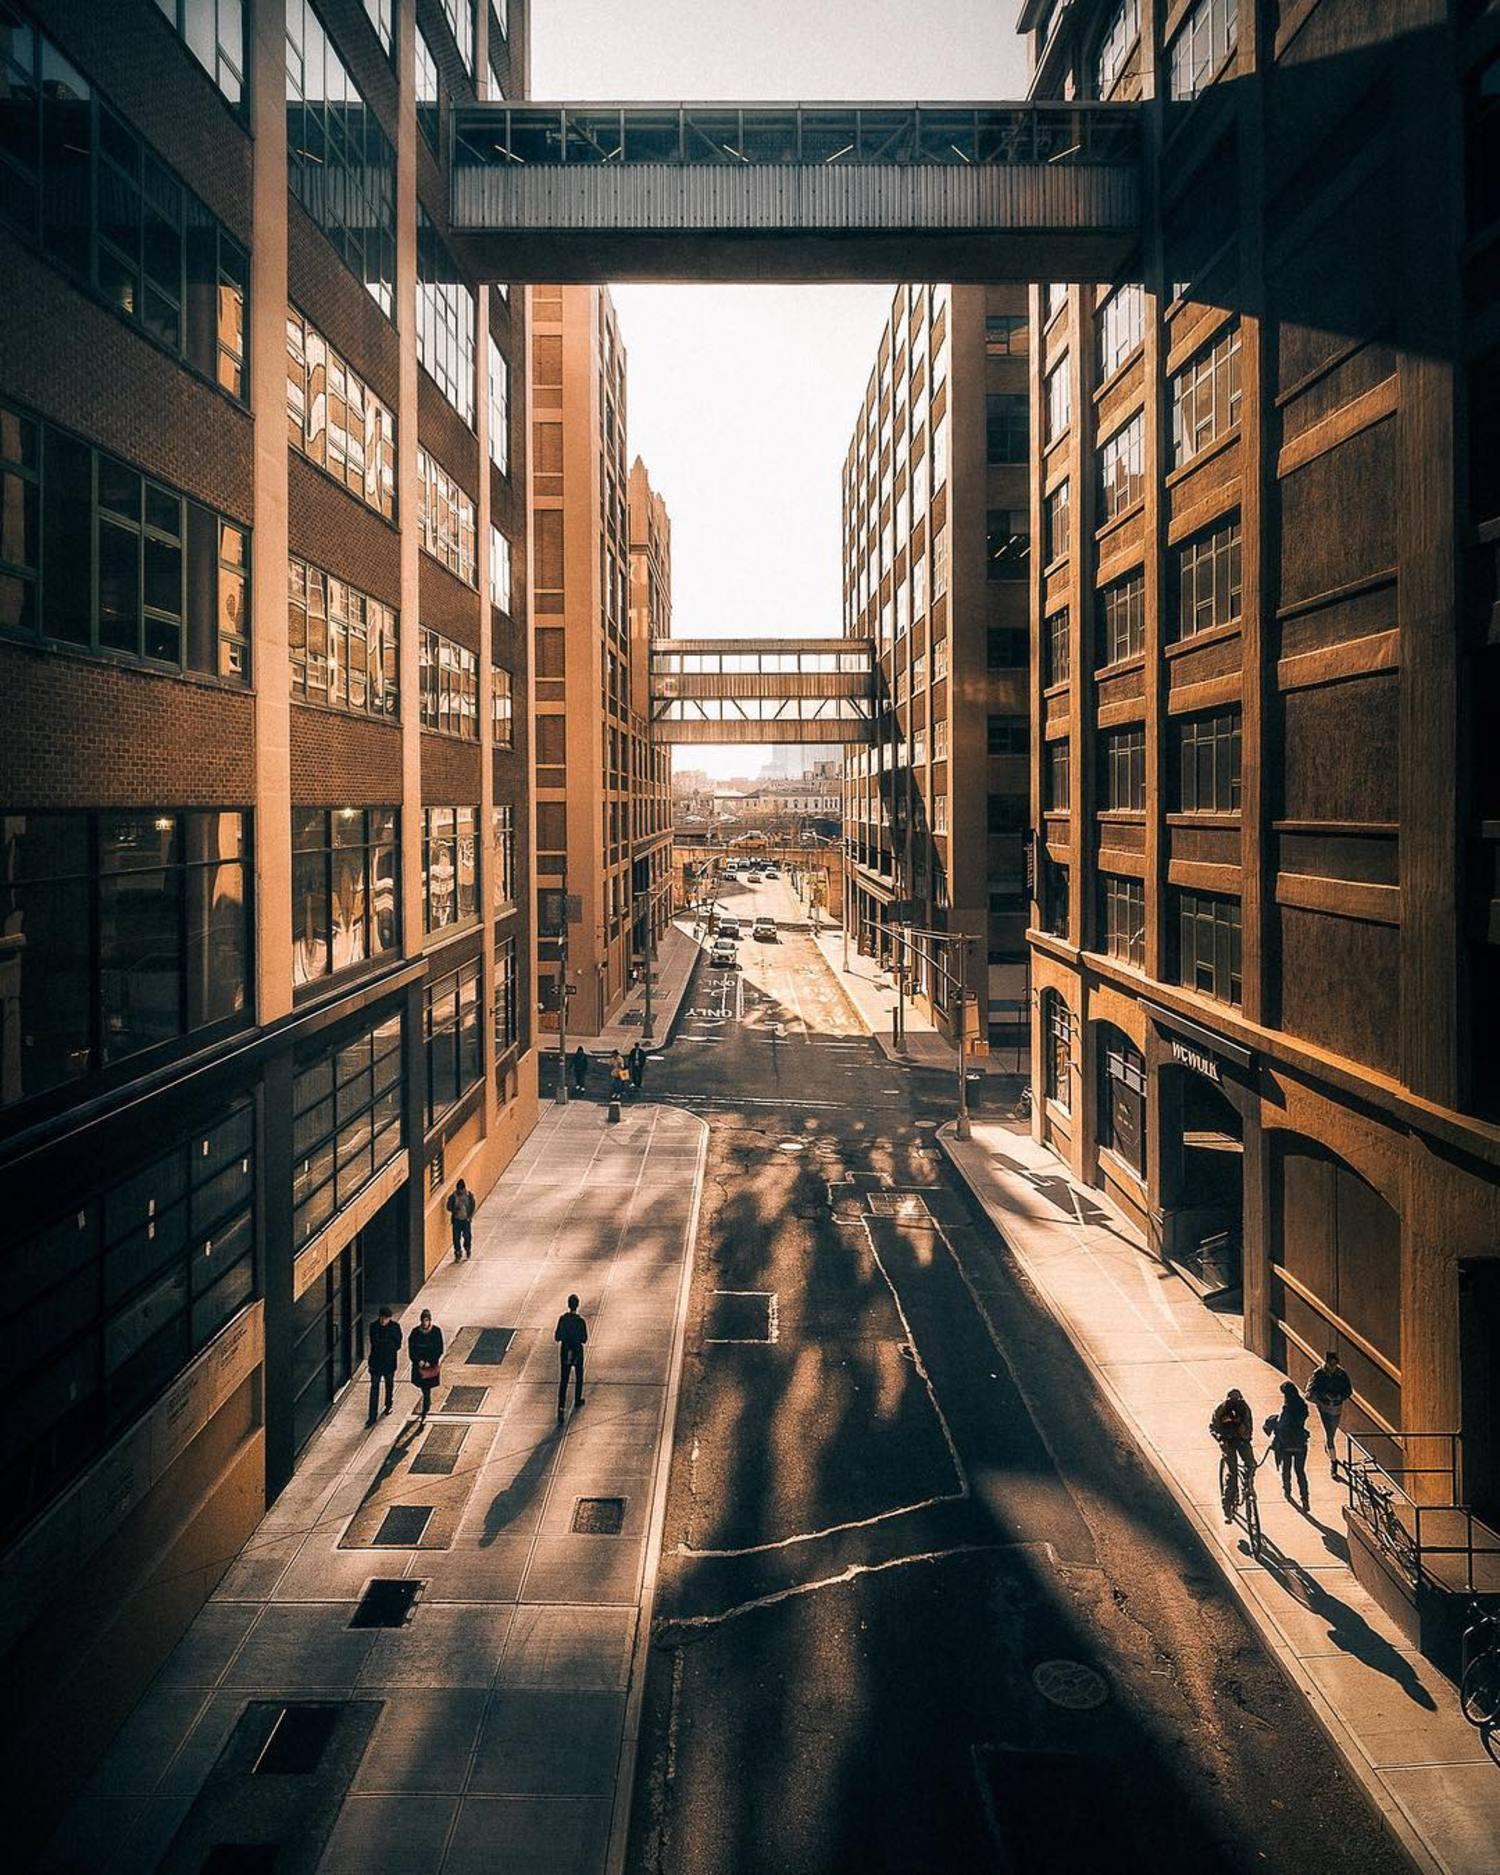 Prospect Street, Dumbo, Brooklyn